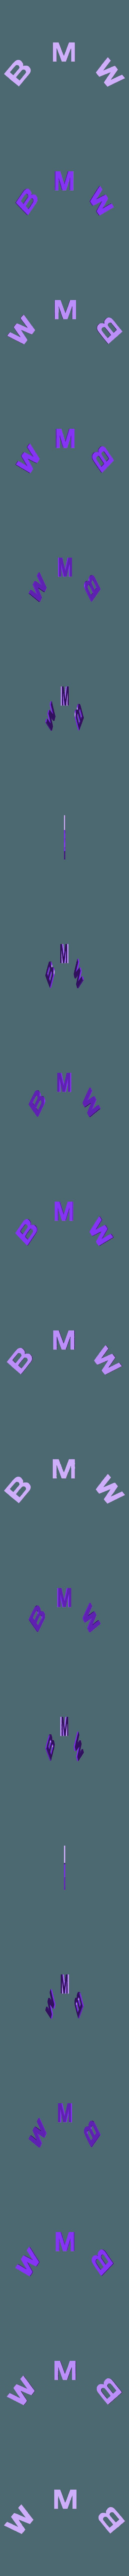 BMW_Letter.stl Download STL file BMW • 3D print template, GREGCAR_3DPrinting